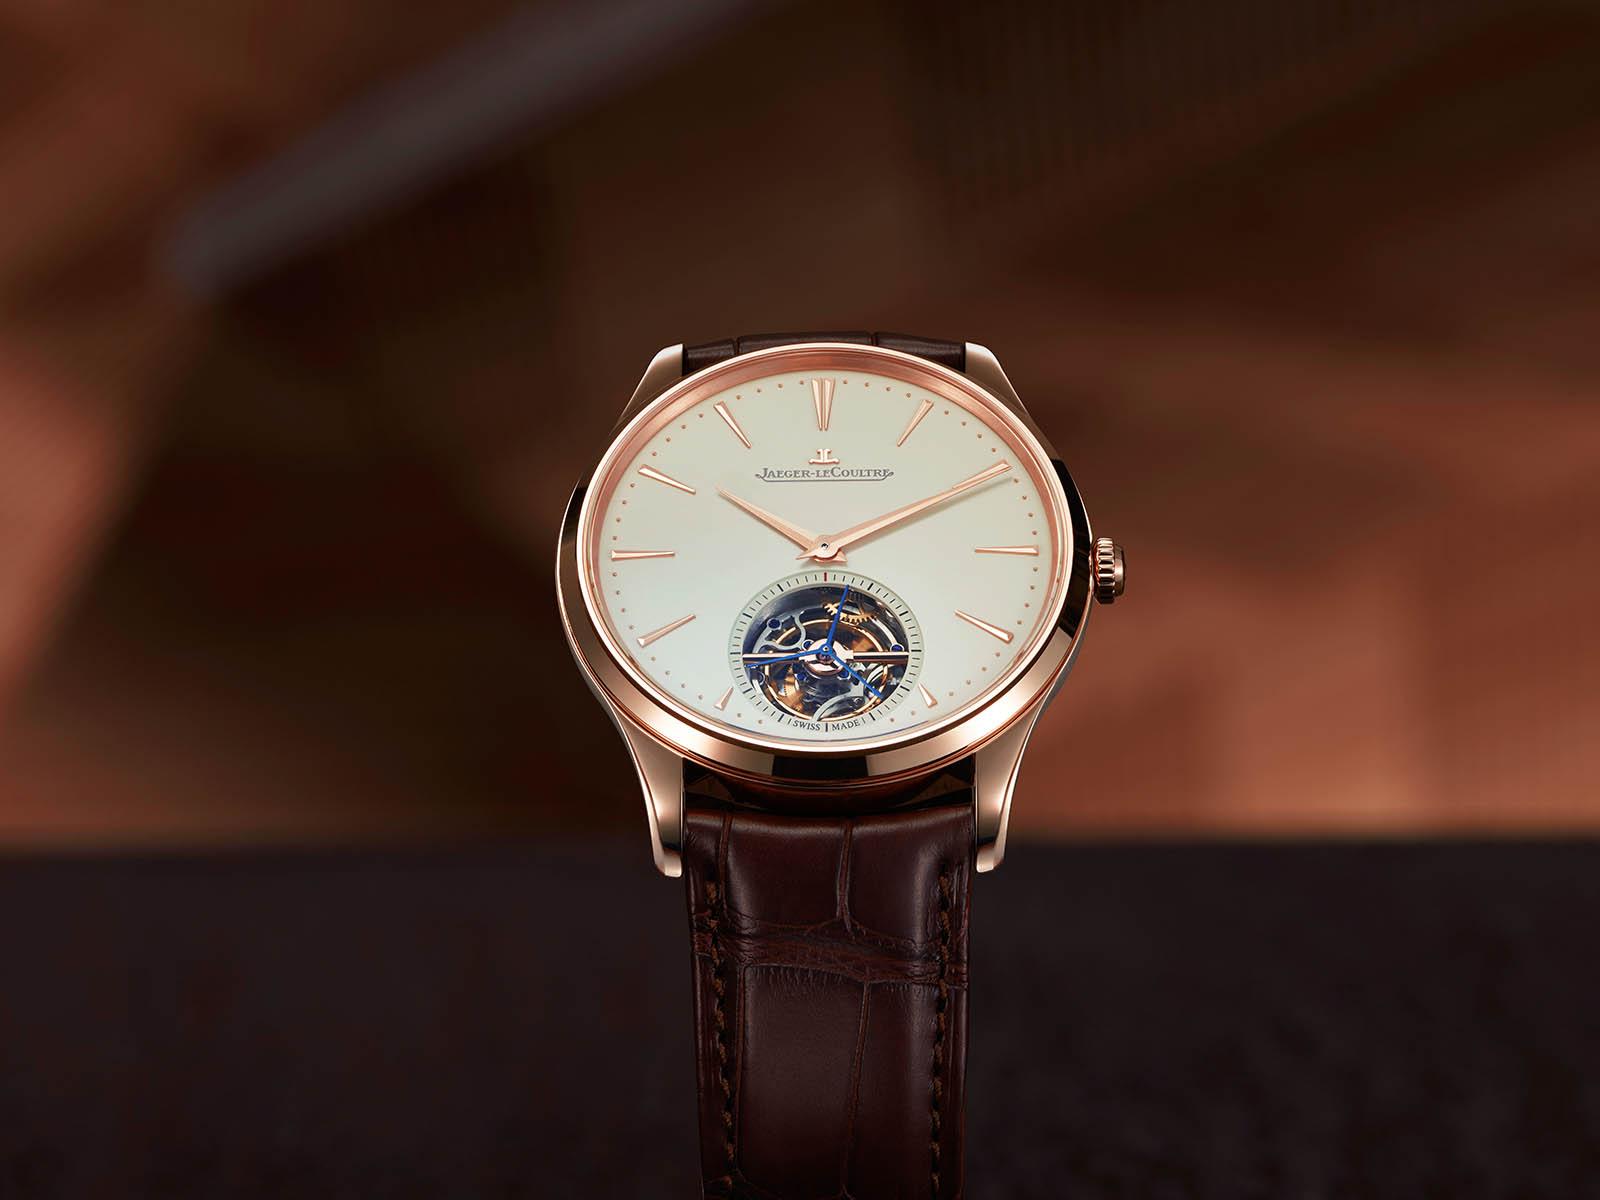 q1682410-jaeger-lecoultre-master-ultra-thin-tourbillon-18k-pink-gold-2.jpg